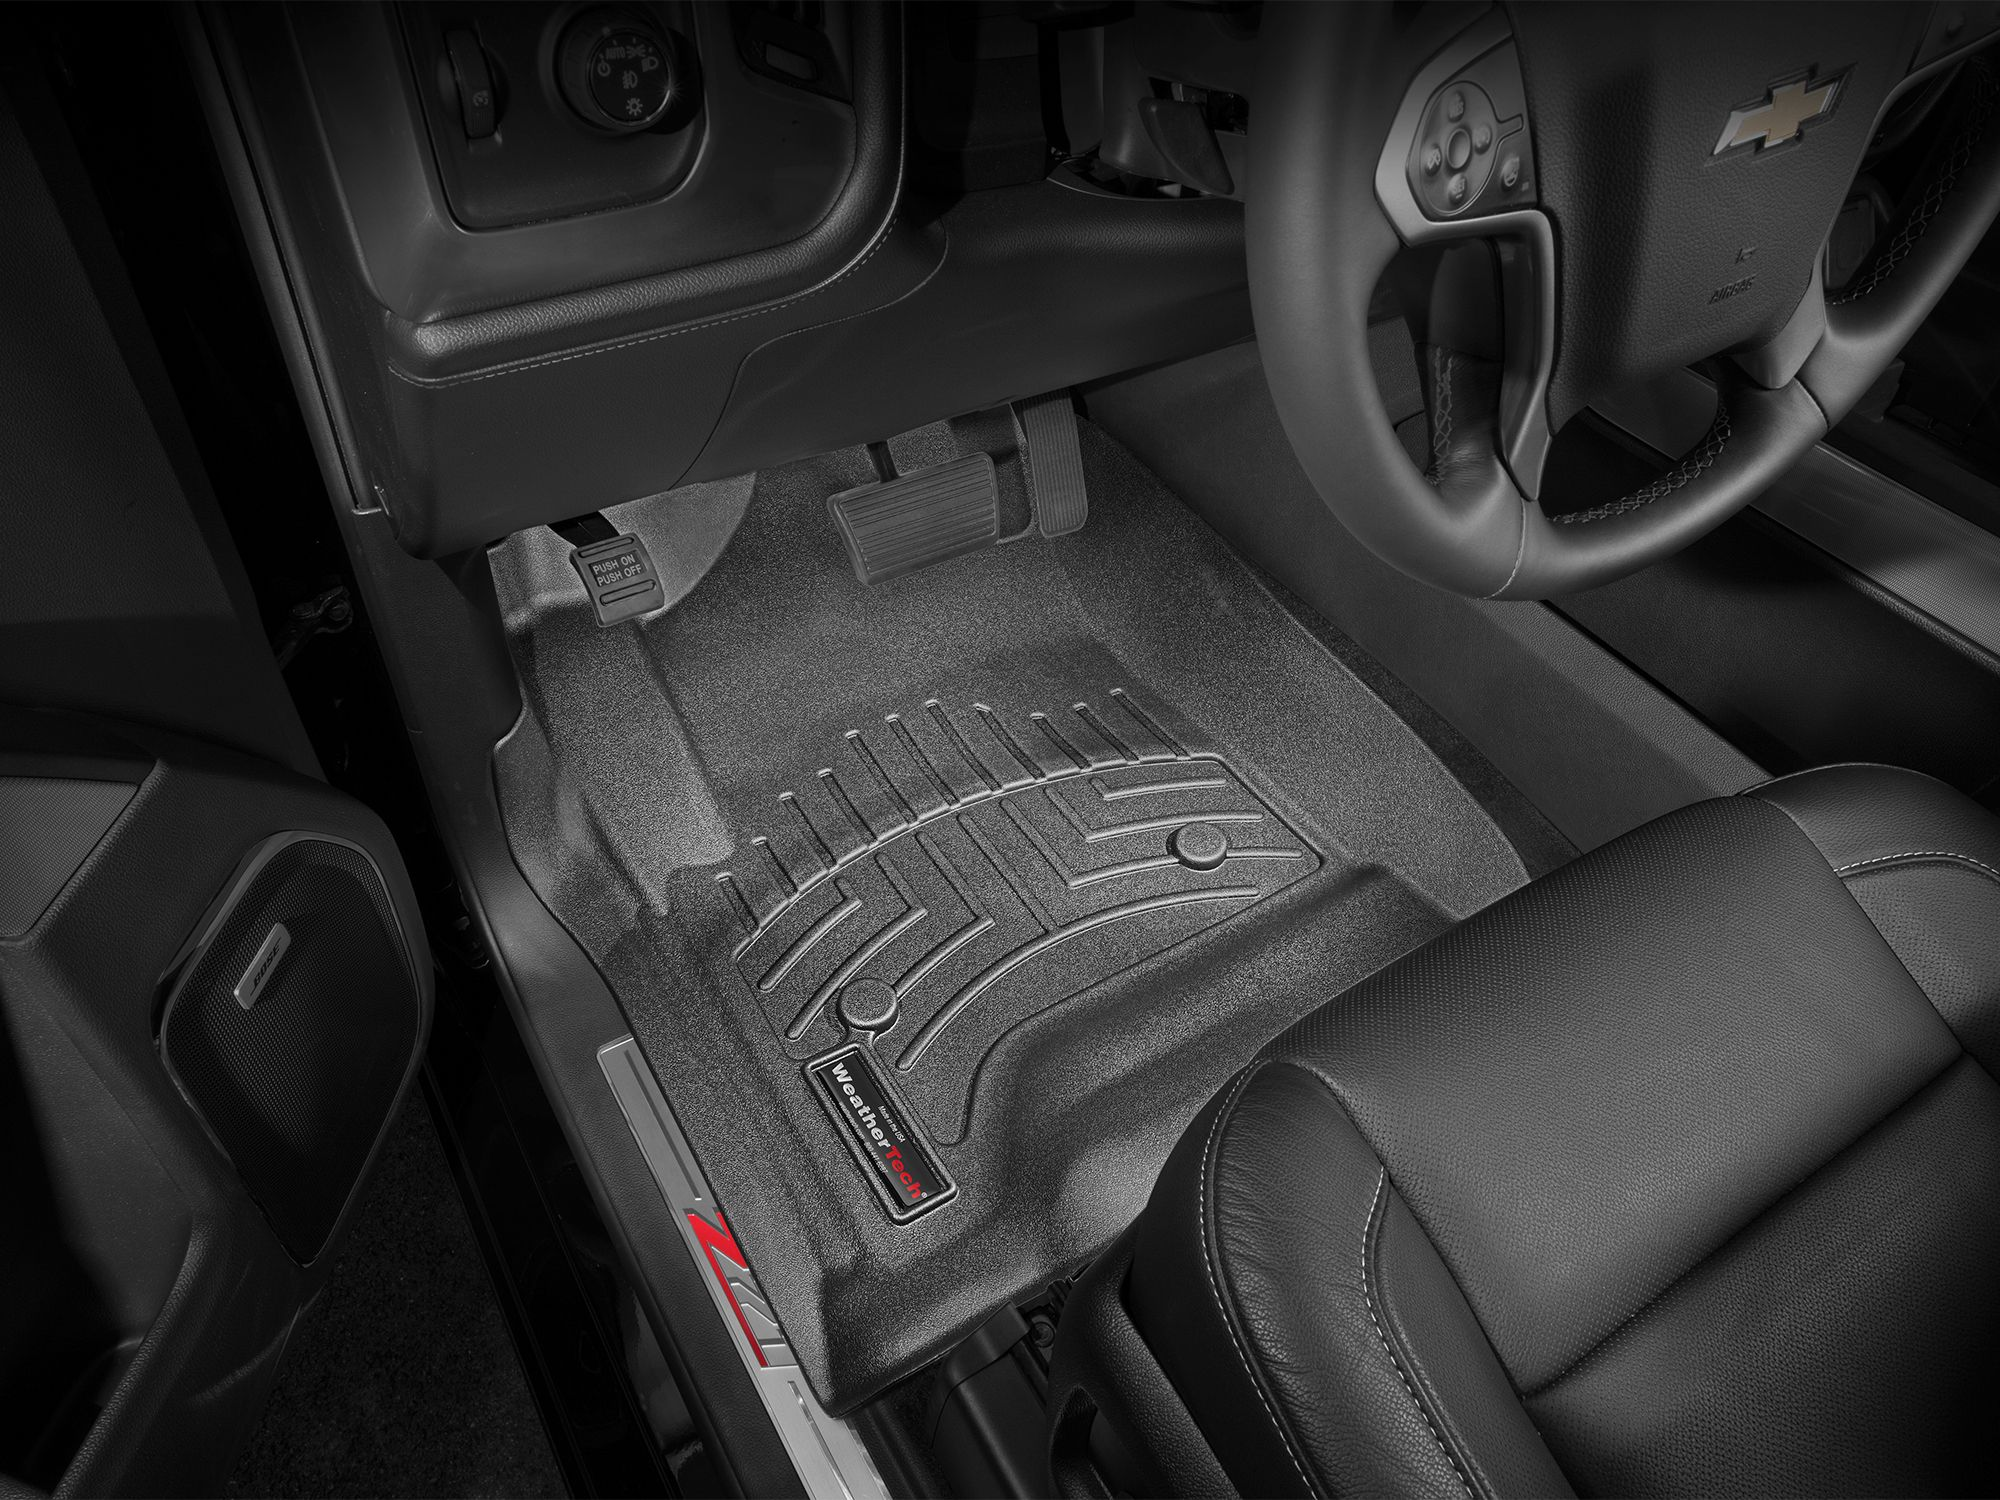 2014 Chevy Silverado WeatherTech® FloorLiners™. Each liner